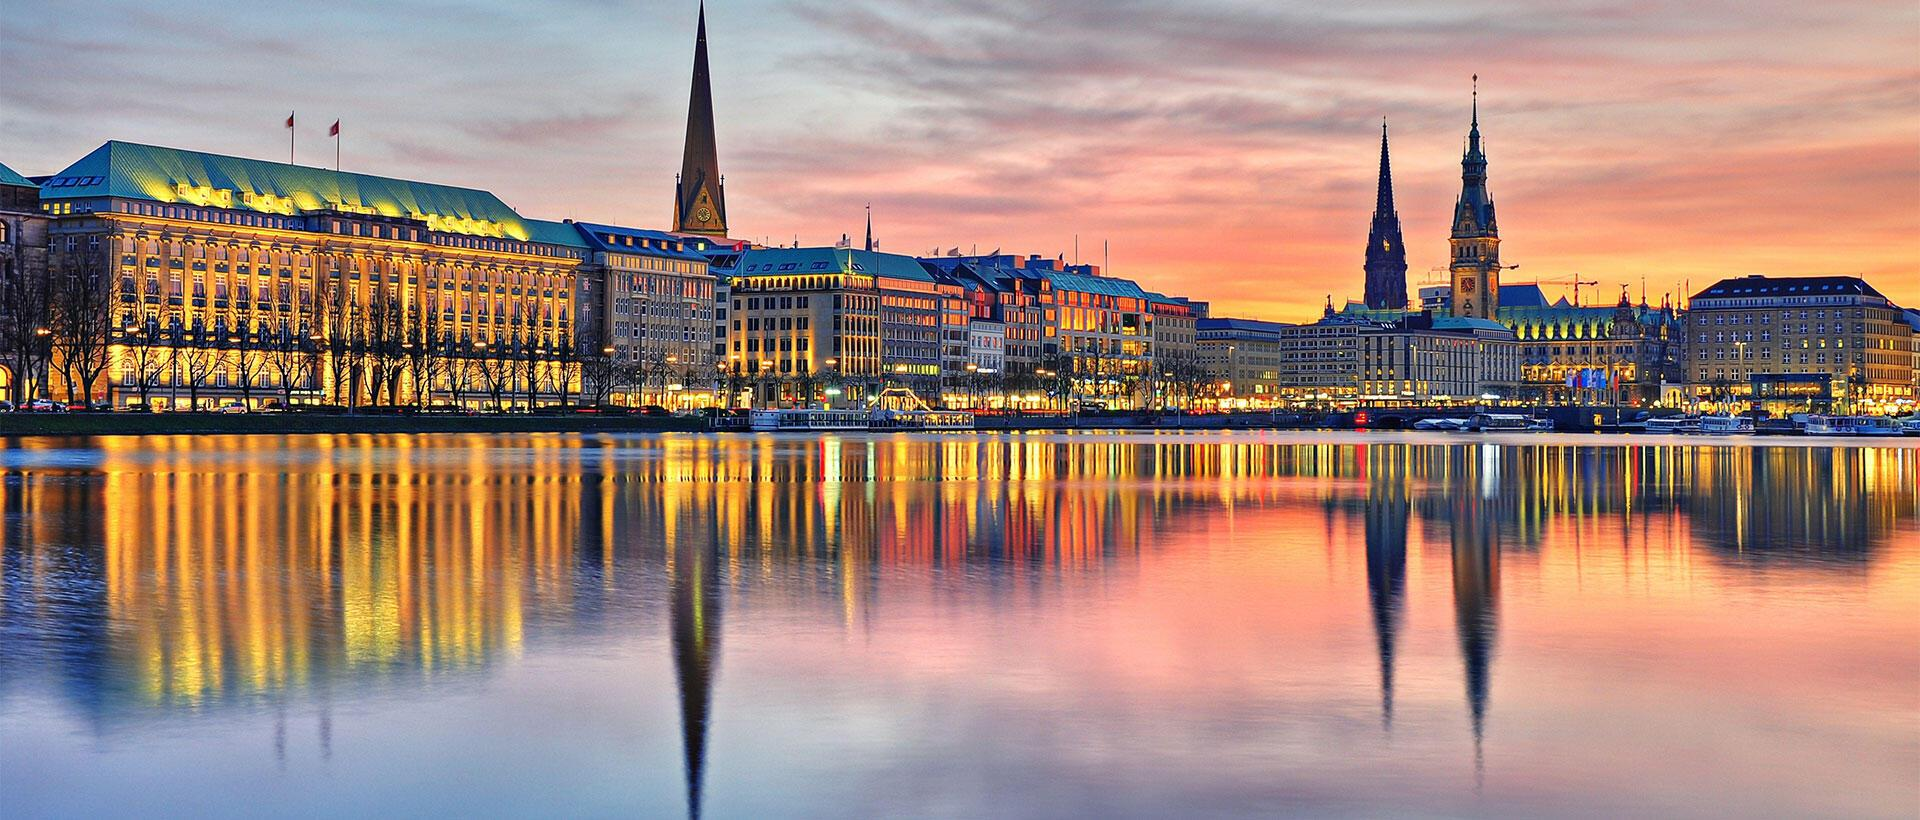 Keşfedilmeyi bekleyen şehir: Hamburg